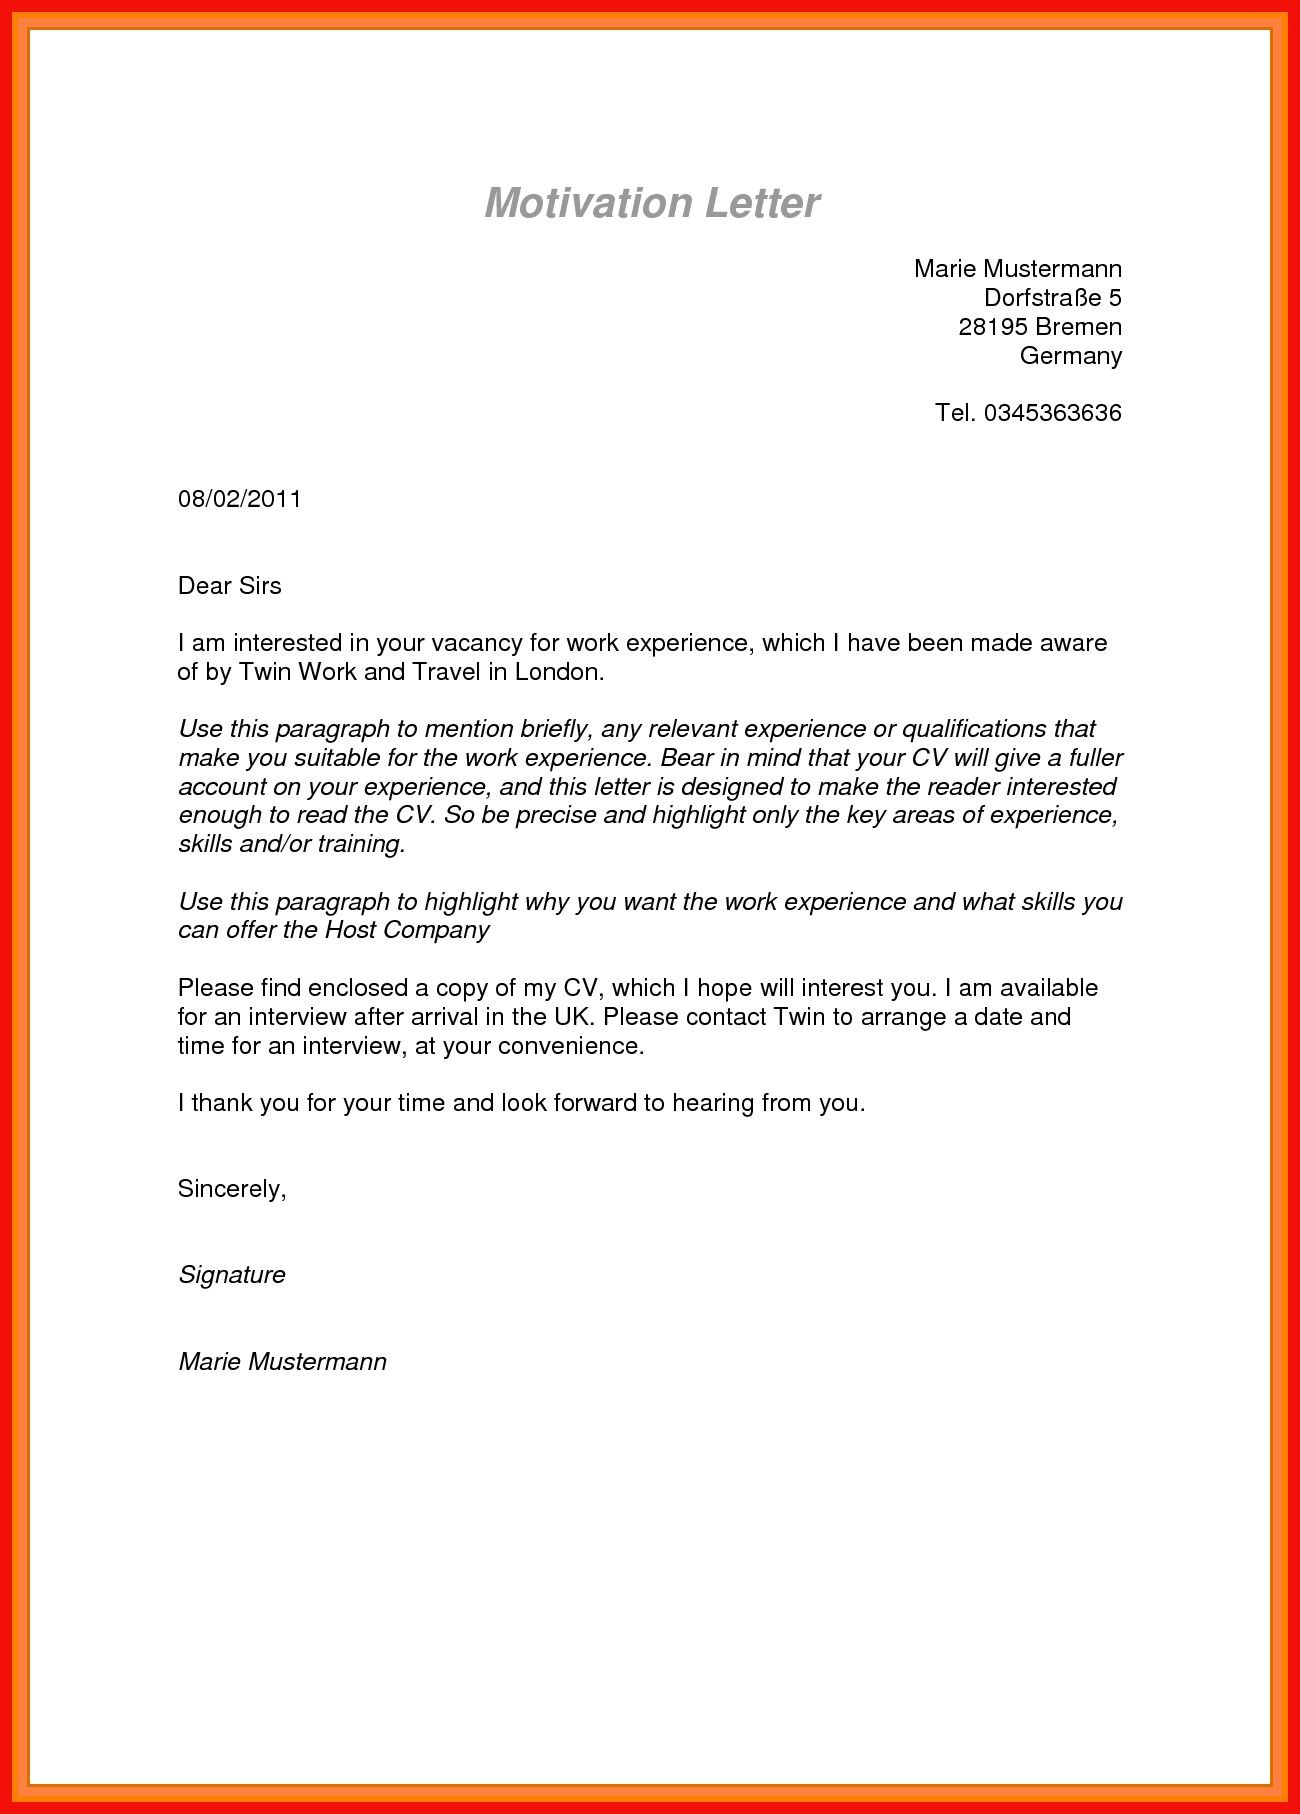 Motivation Letter Format For Internship Scholarship Employment Motivation Letter Motivation Letter For Job Motivational Letter Lettering